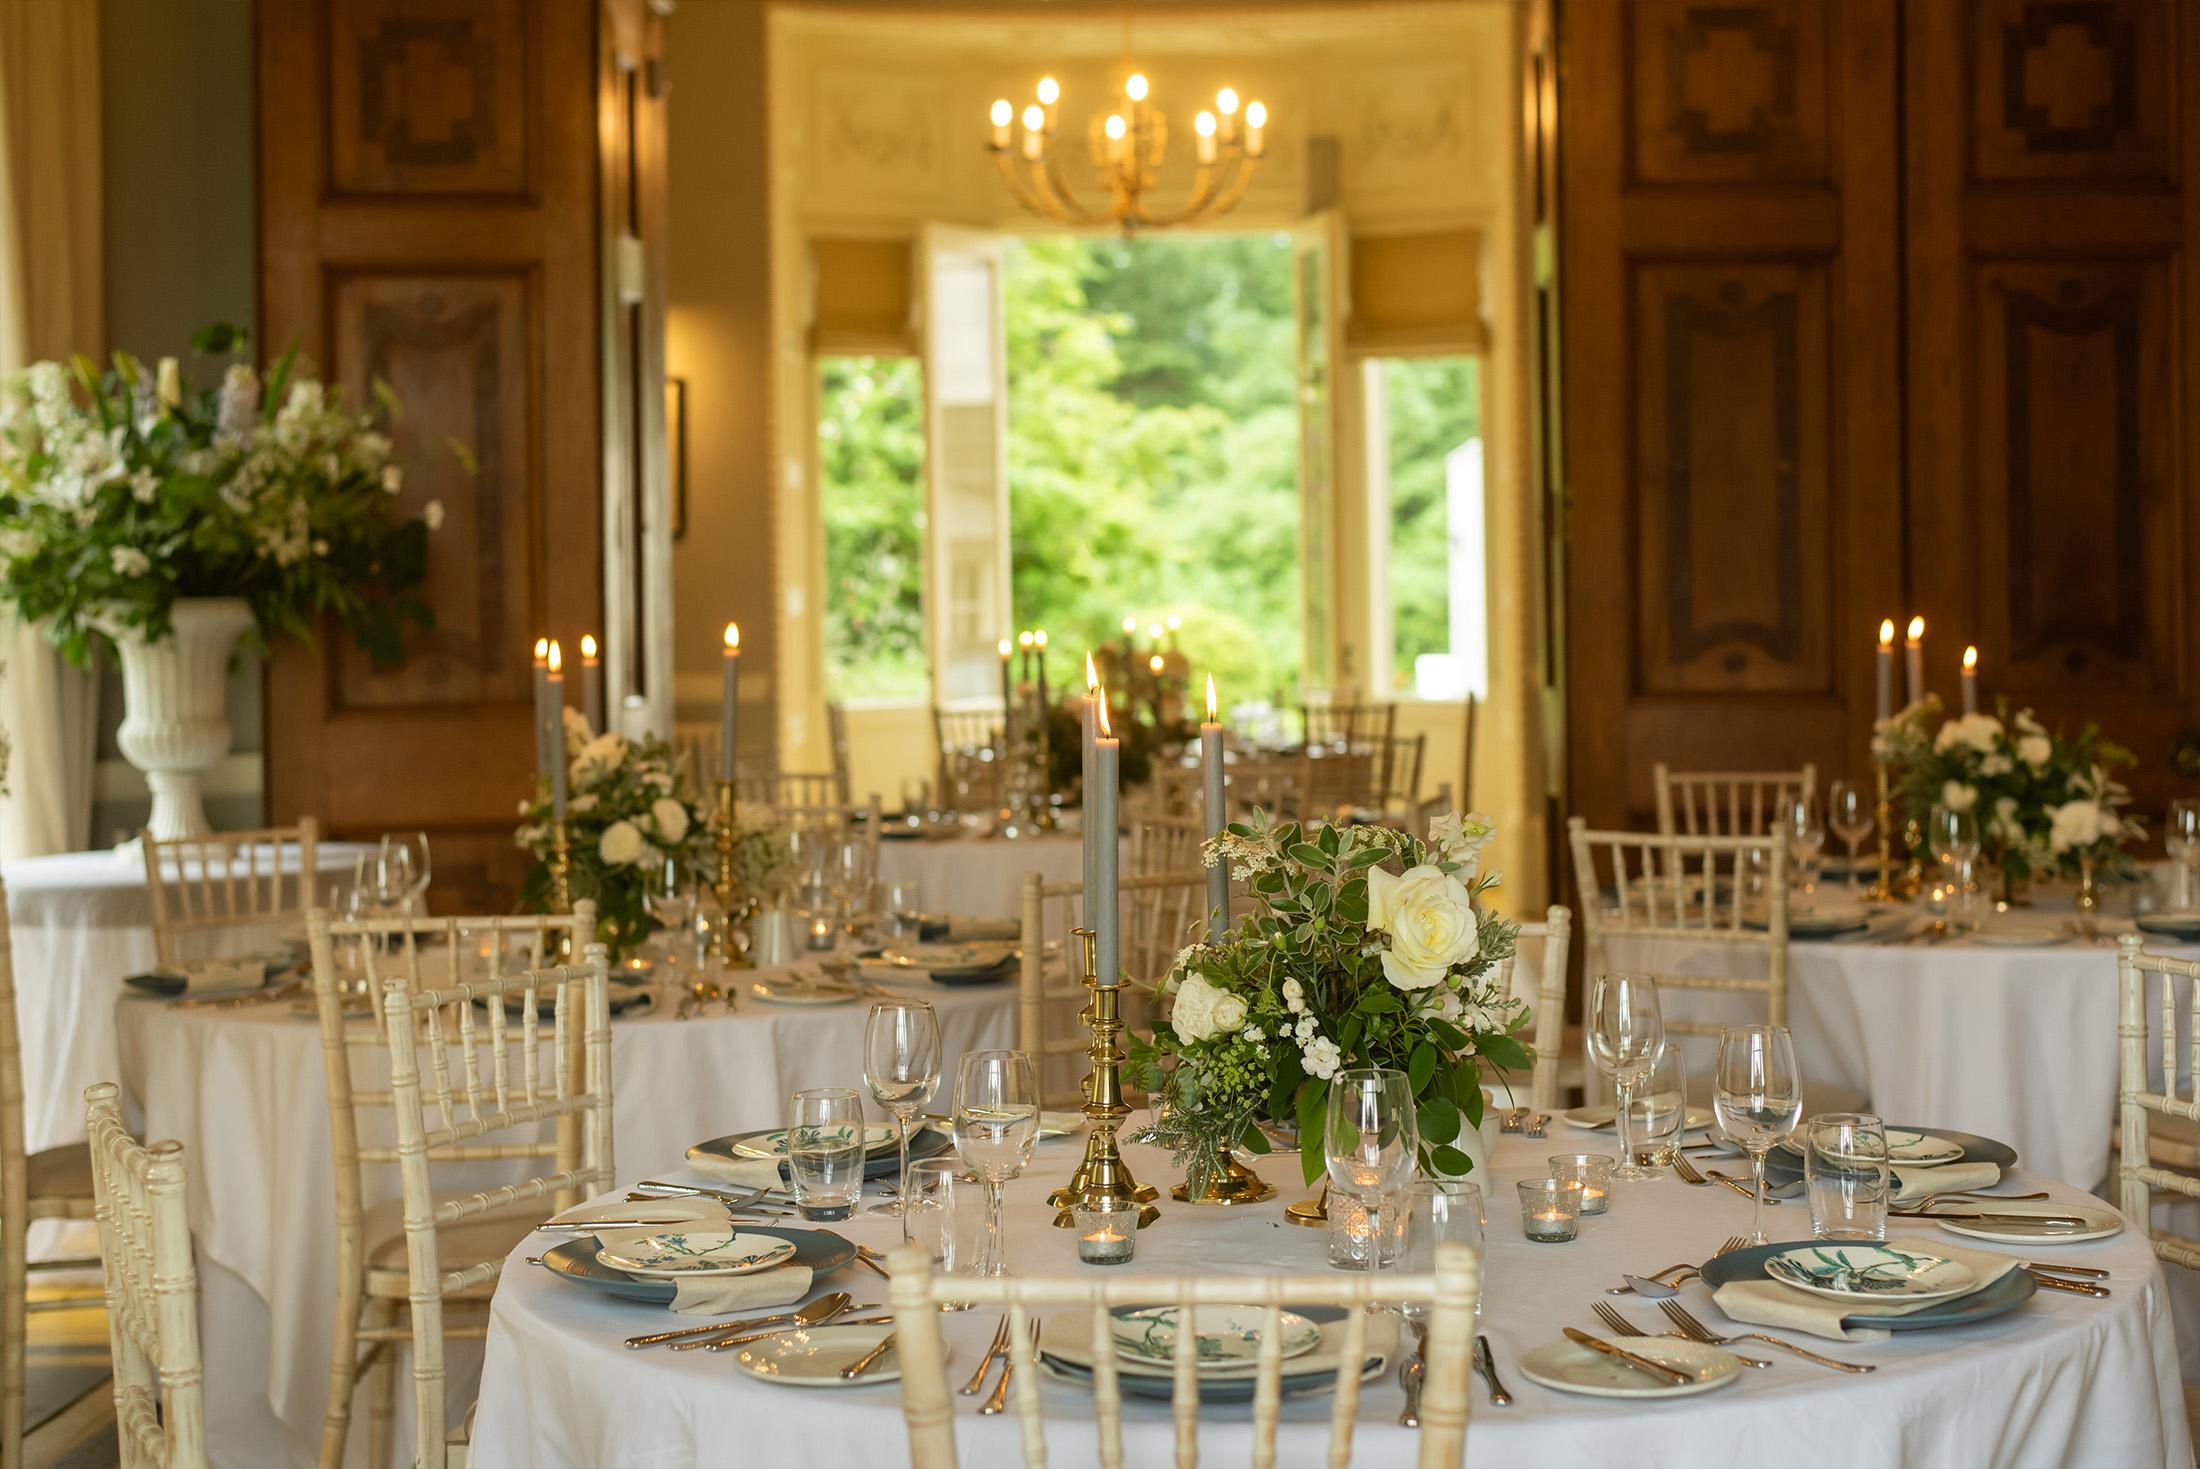 weddings venue Ballykealey house